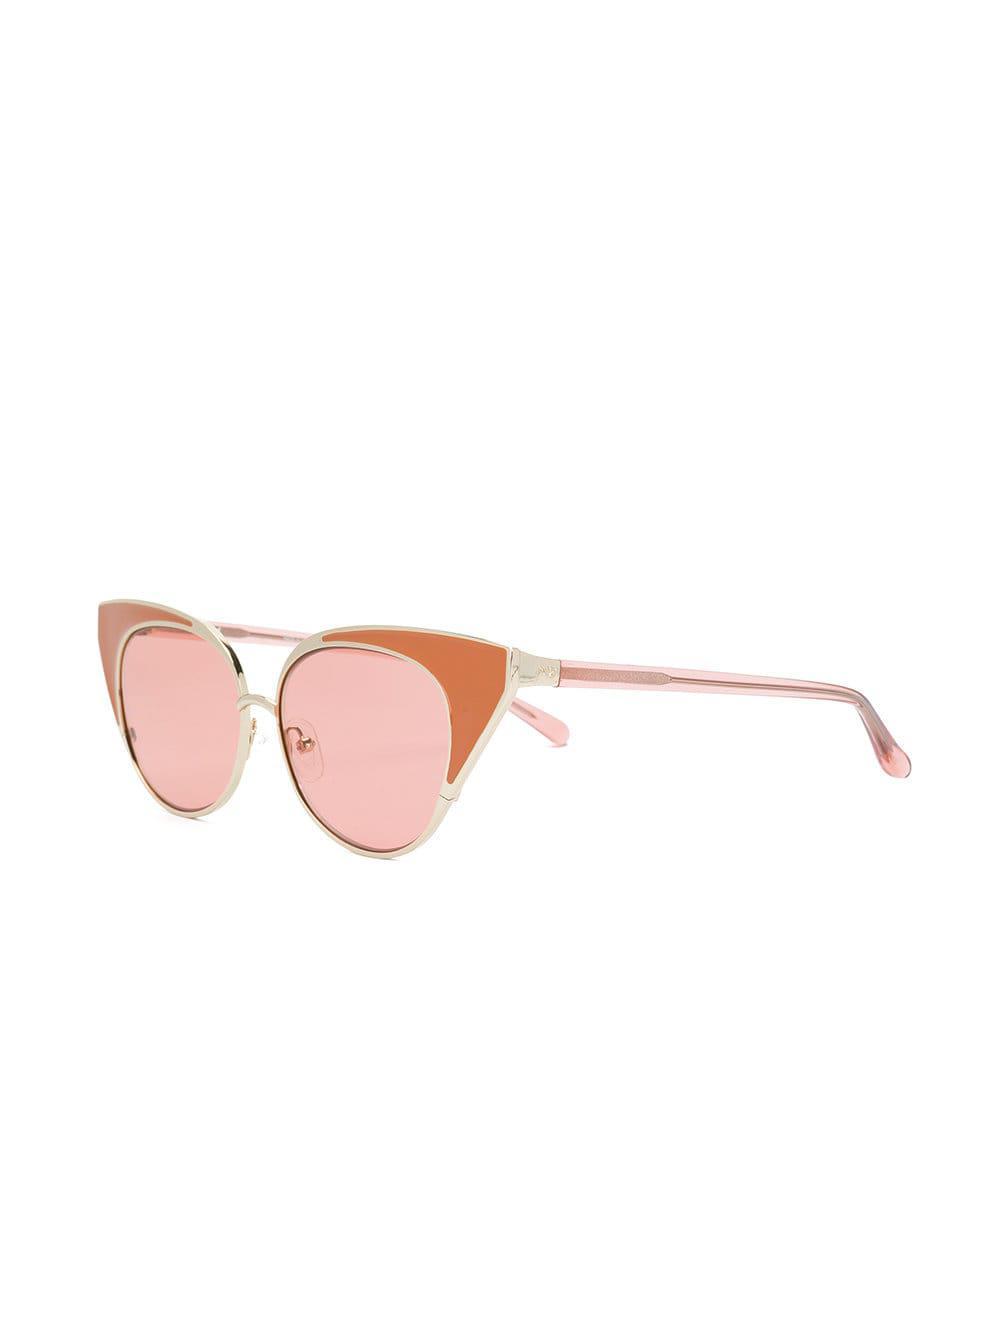 4769a2e54f1 N°21 X Linda Farrow Cat-eye Sunglasses in Pink - Save 19.742489270386272% -  Lyst